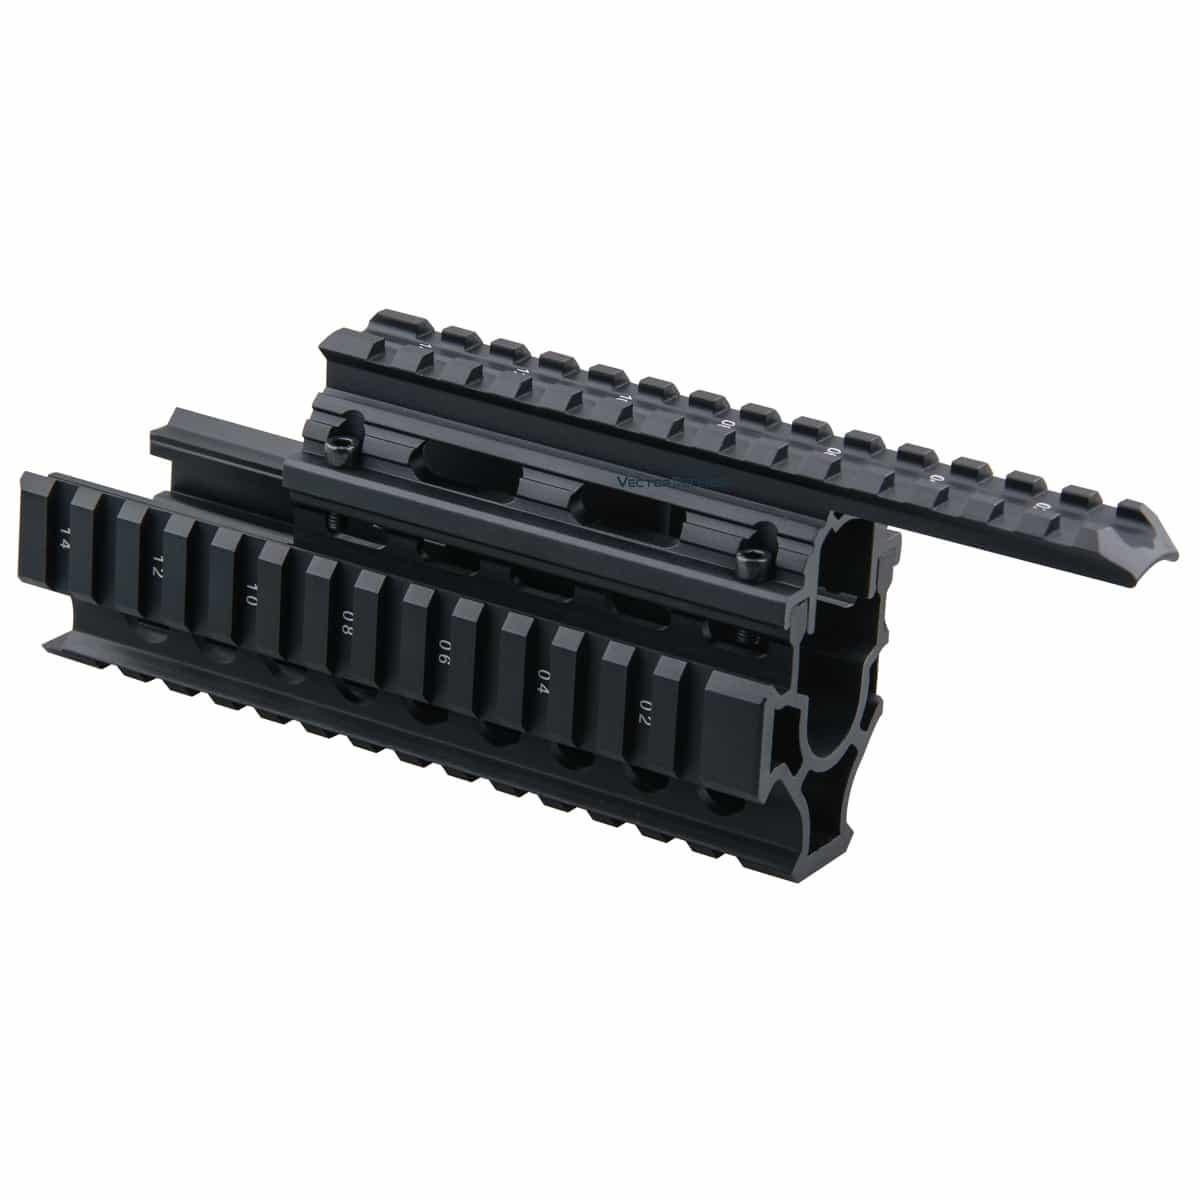 AK Handguard RIS Quad Rail System